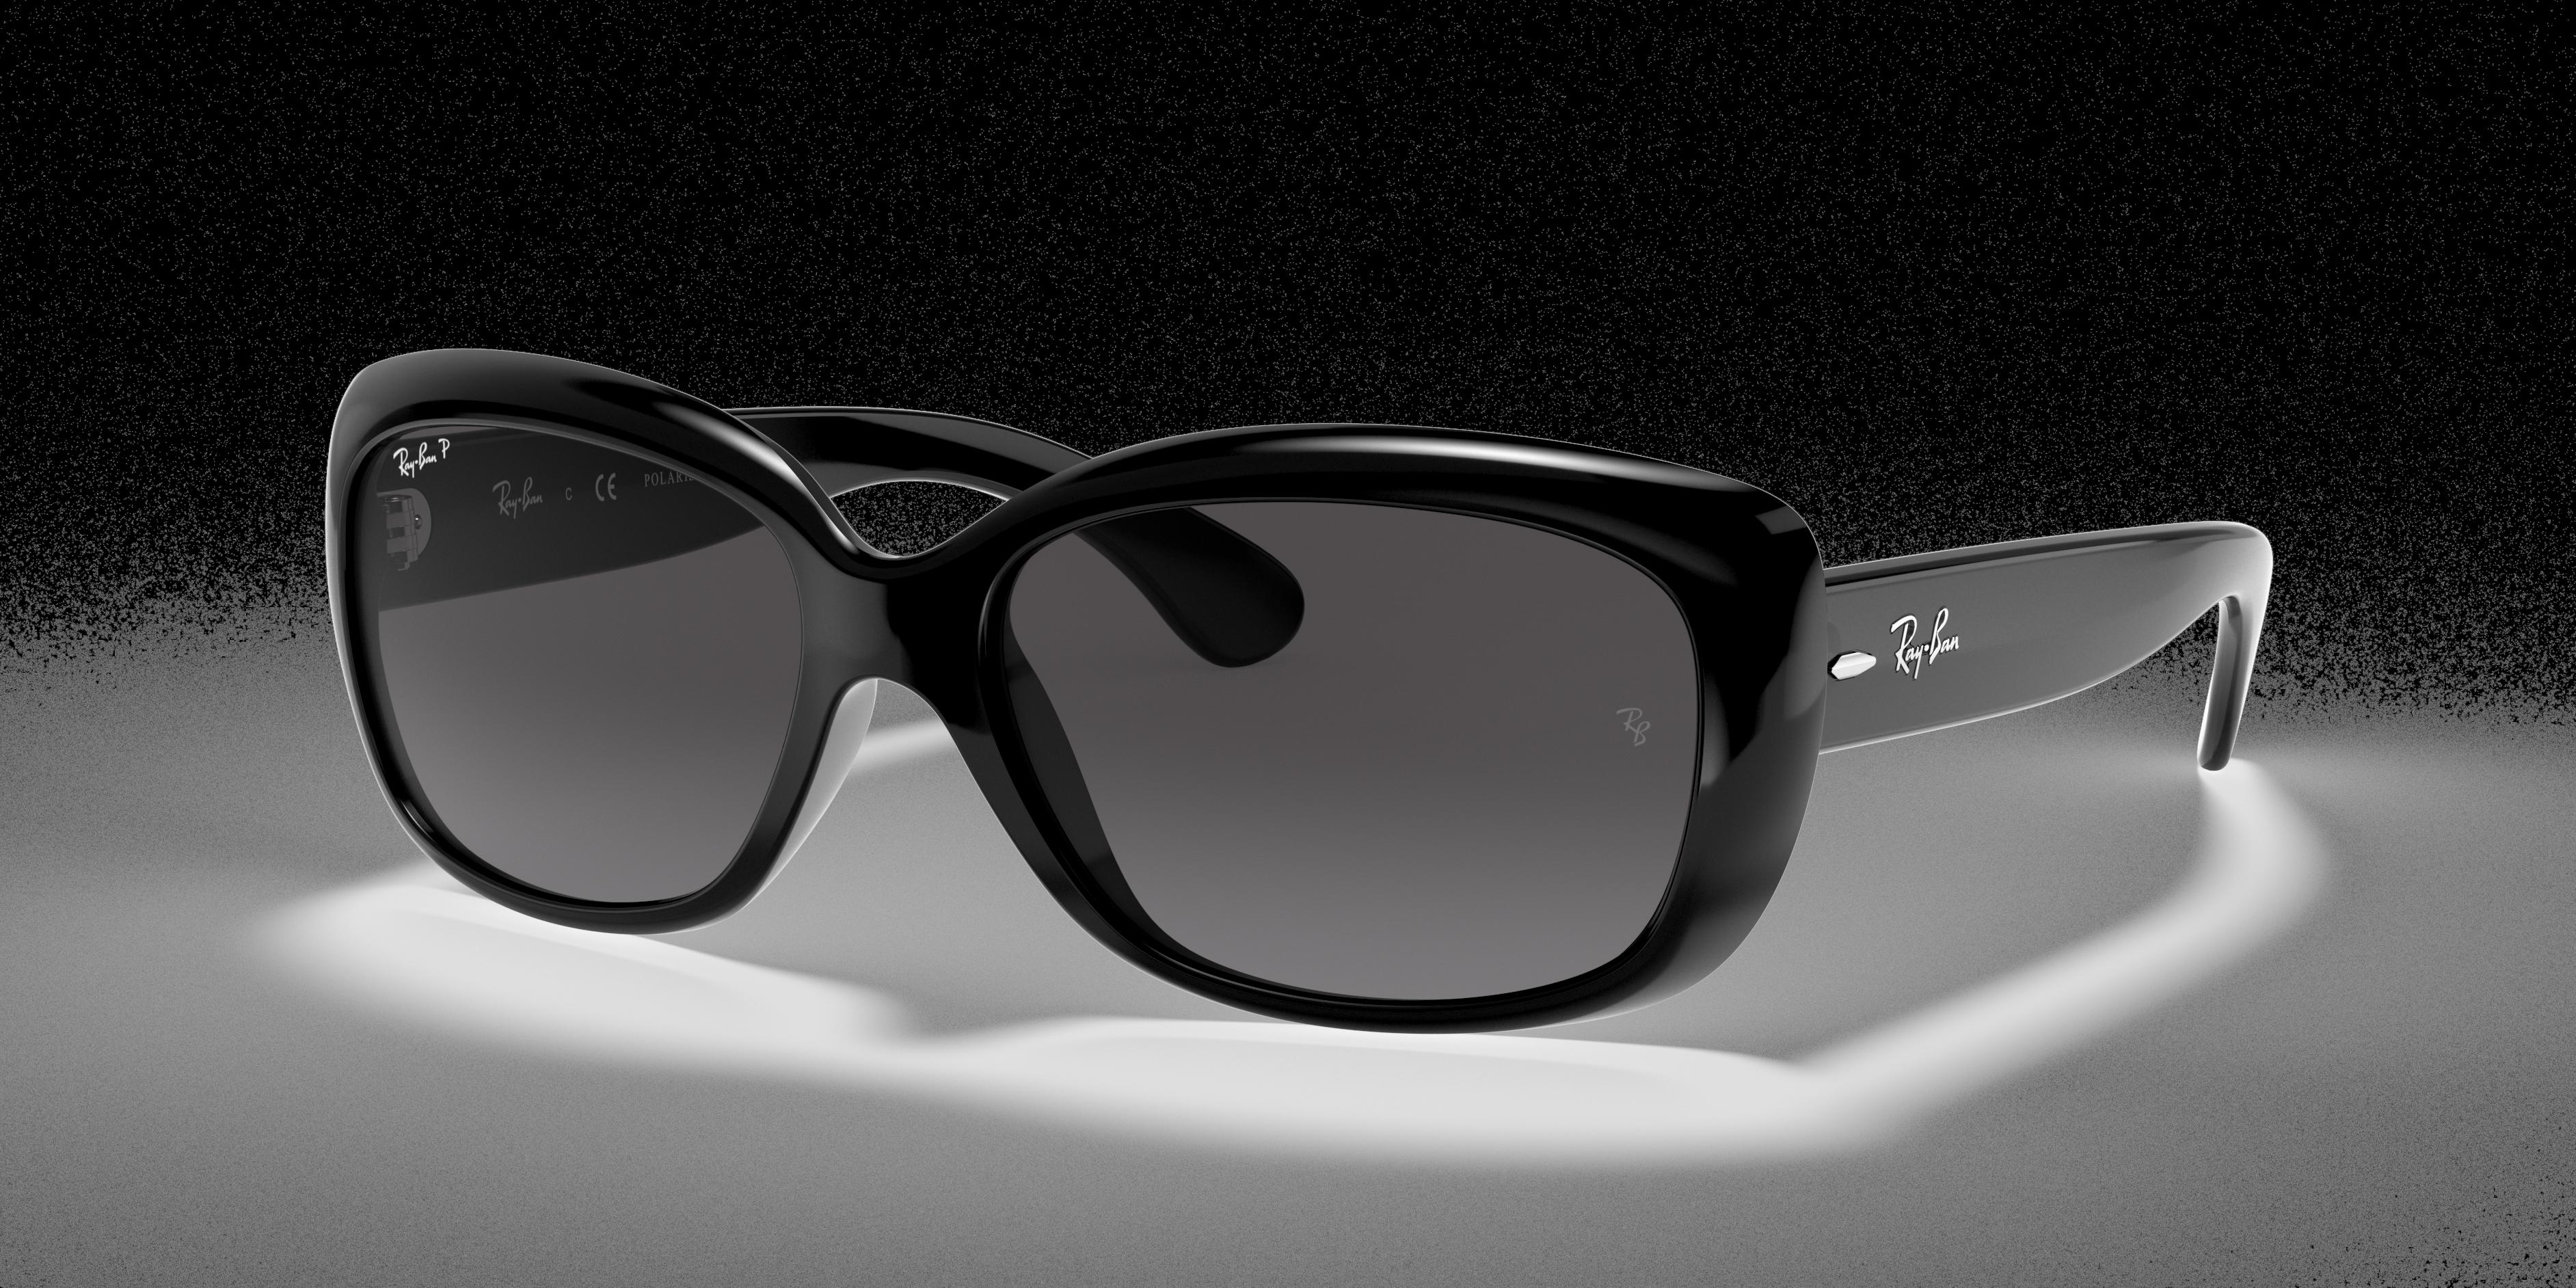 Ray-Ban Jackie Ohh Low Bridge Fit Black, Polarized Gray Lenses - RB4101F